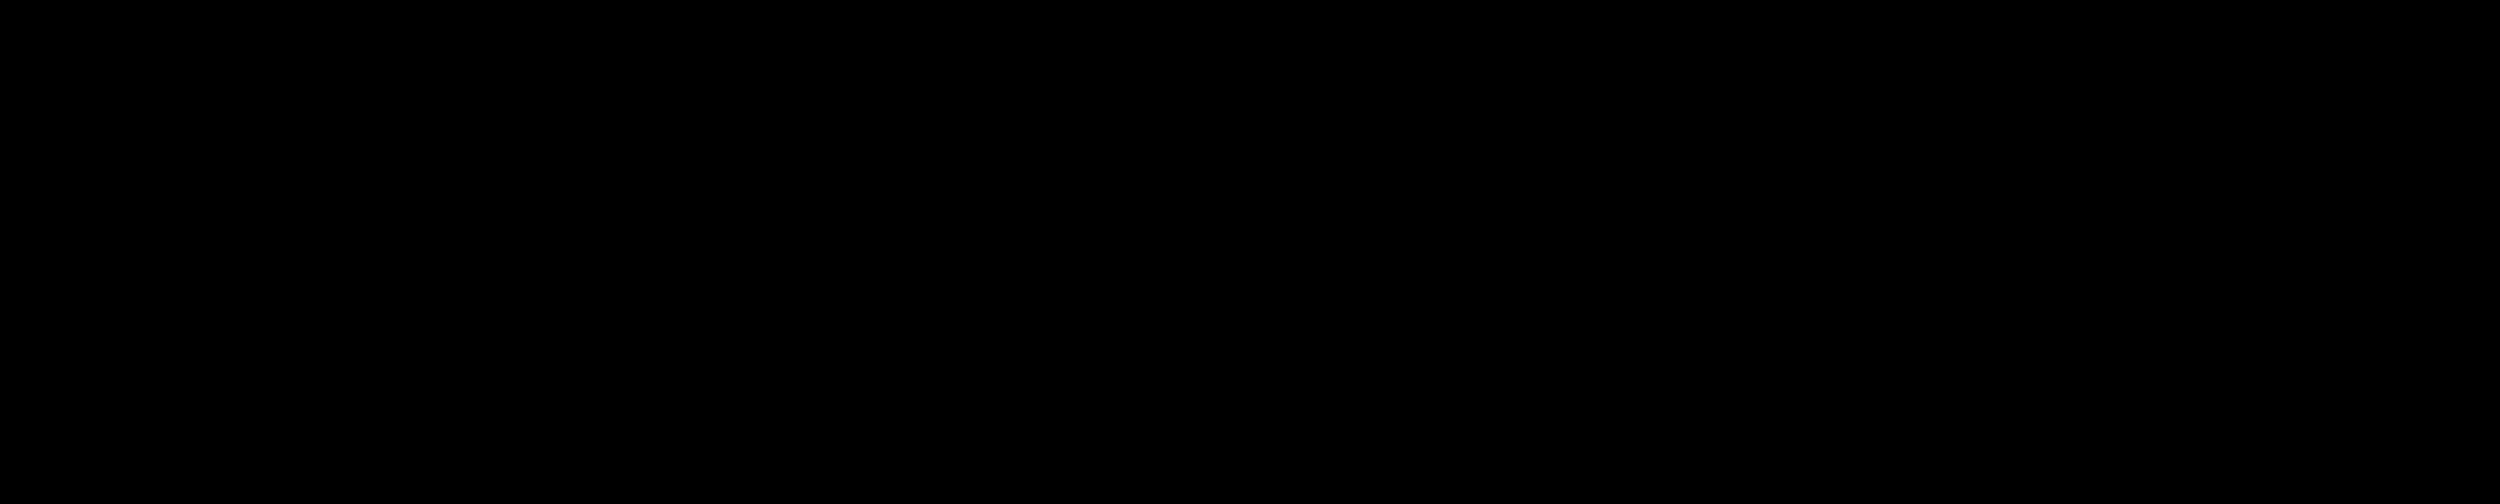 banner-tiger-text-black.png